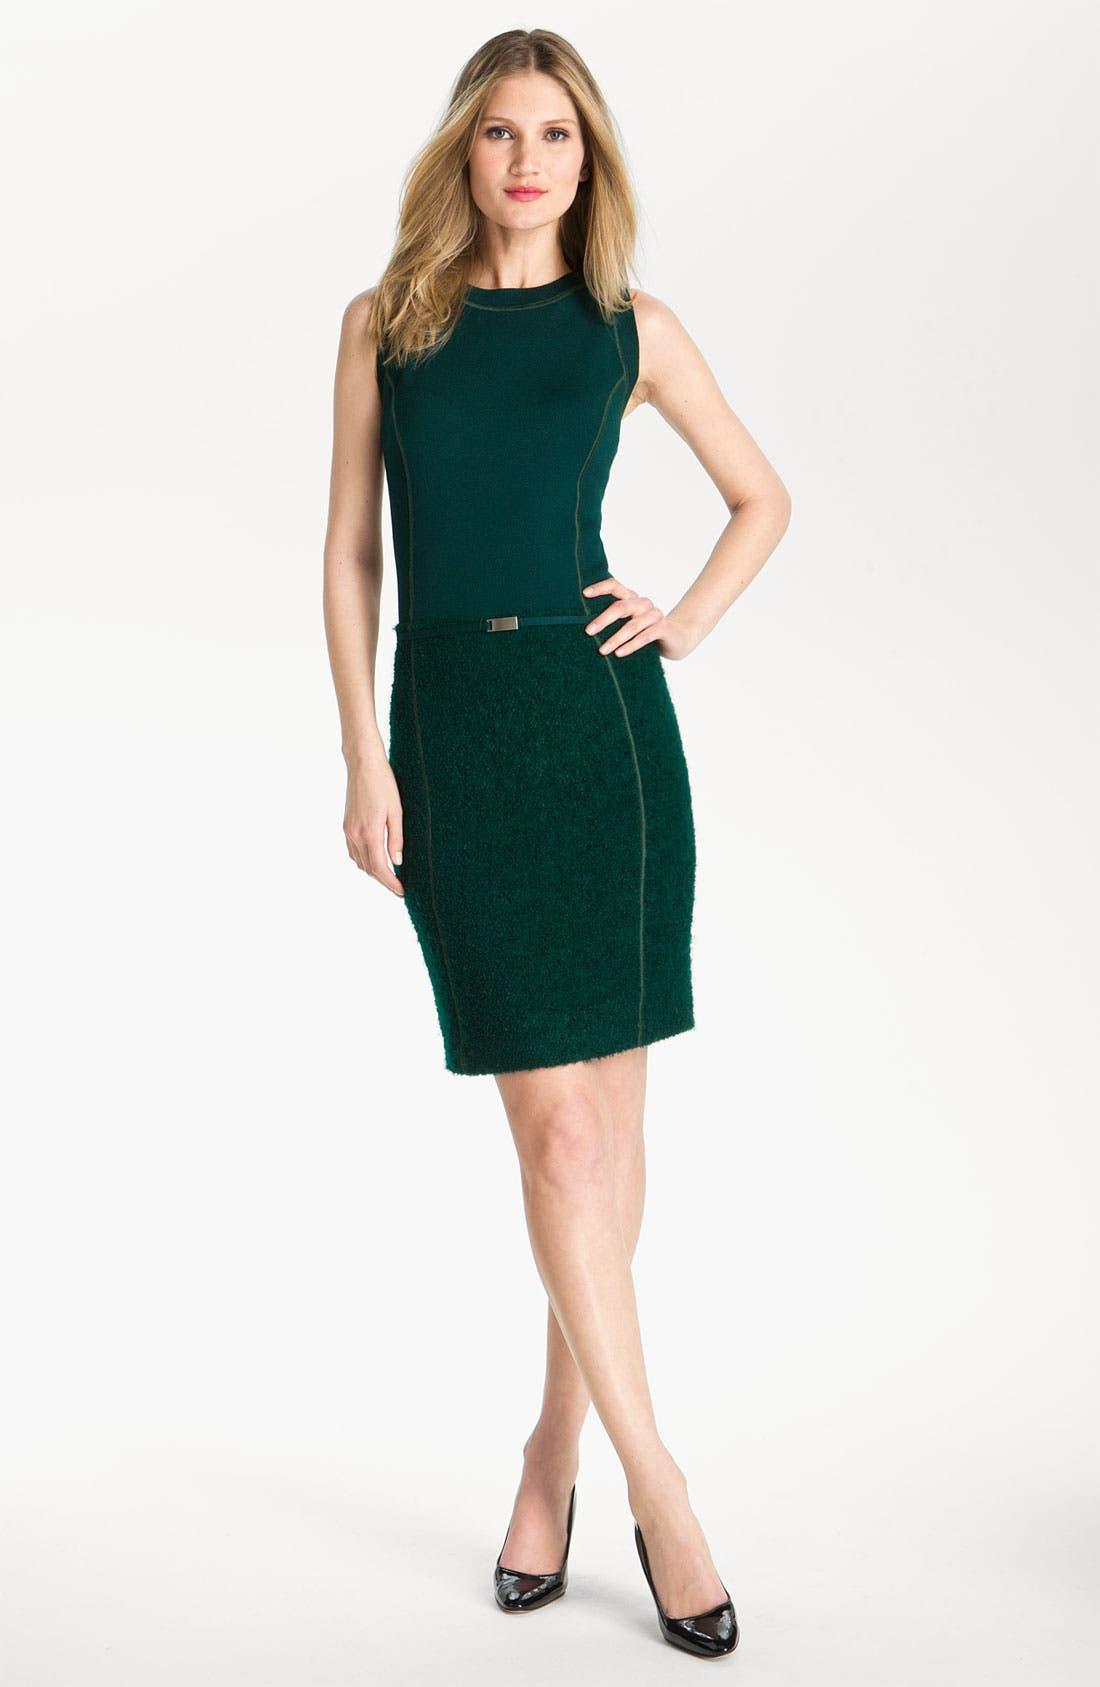 Main Image - St. John Collection Milano Knit & Boucle Dress